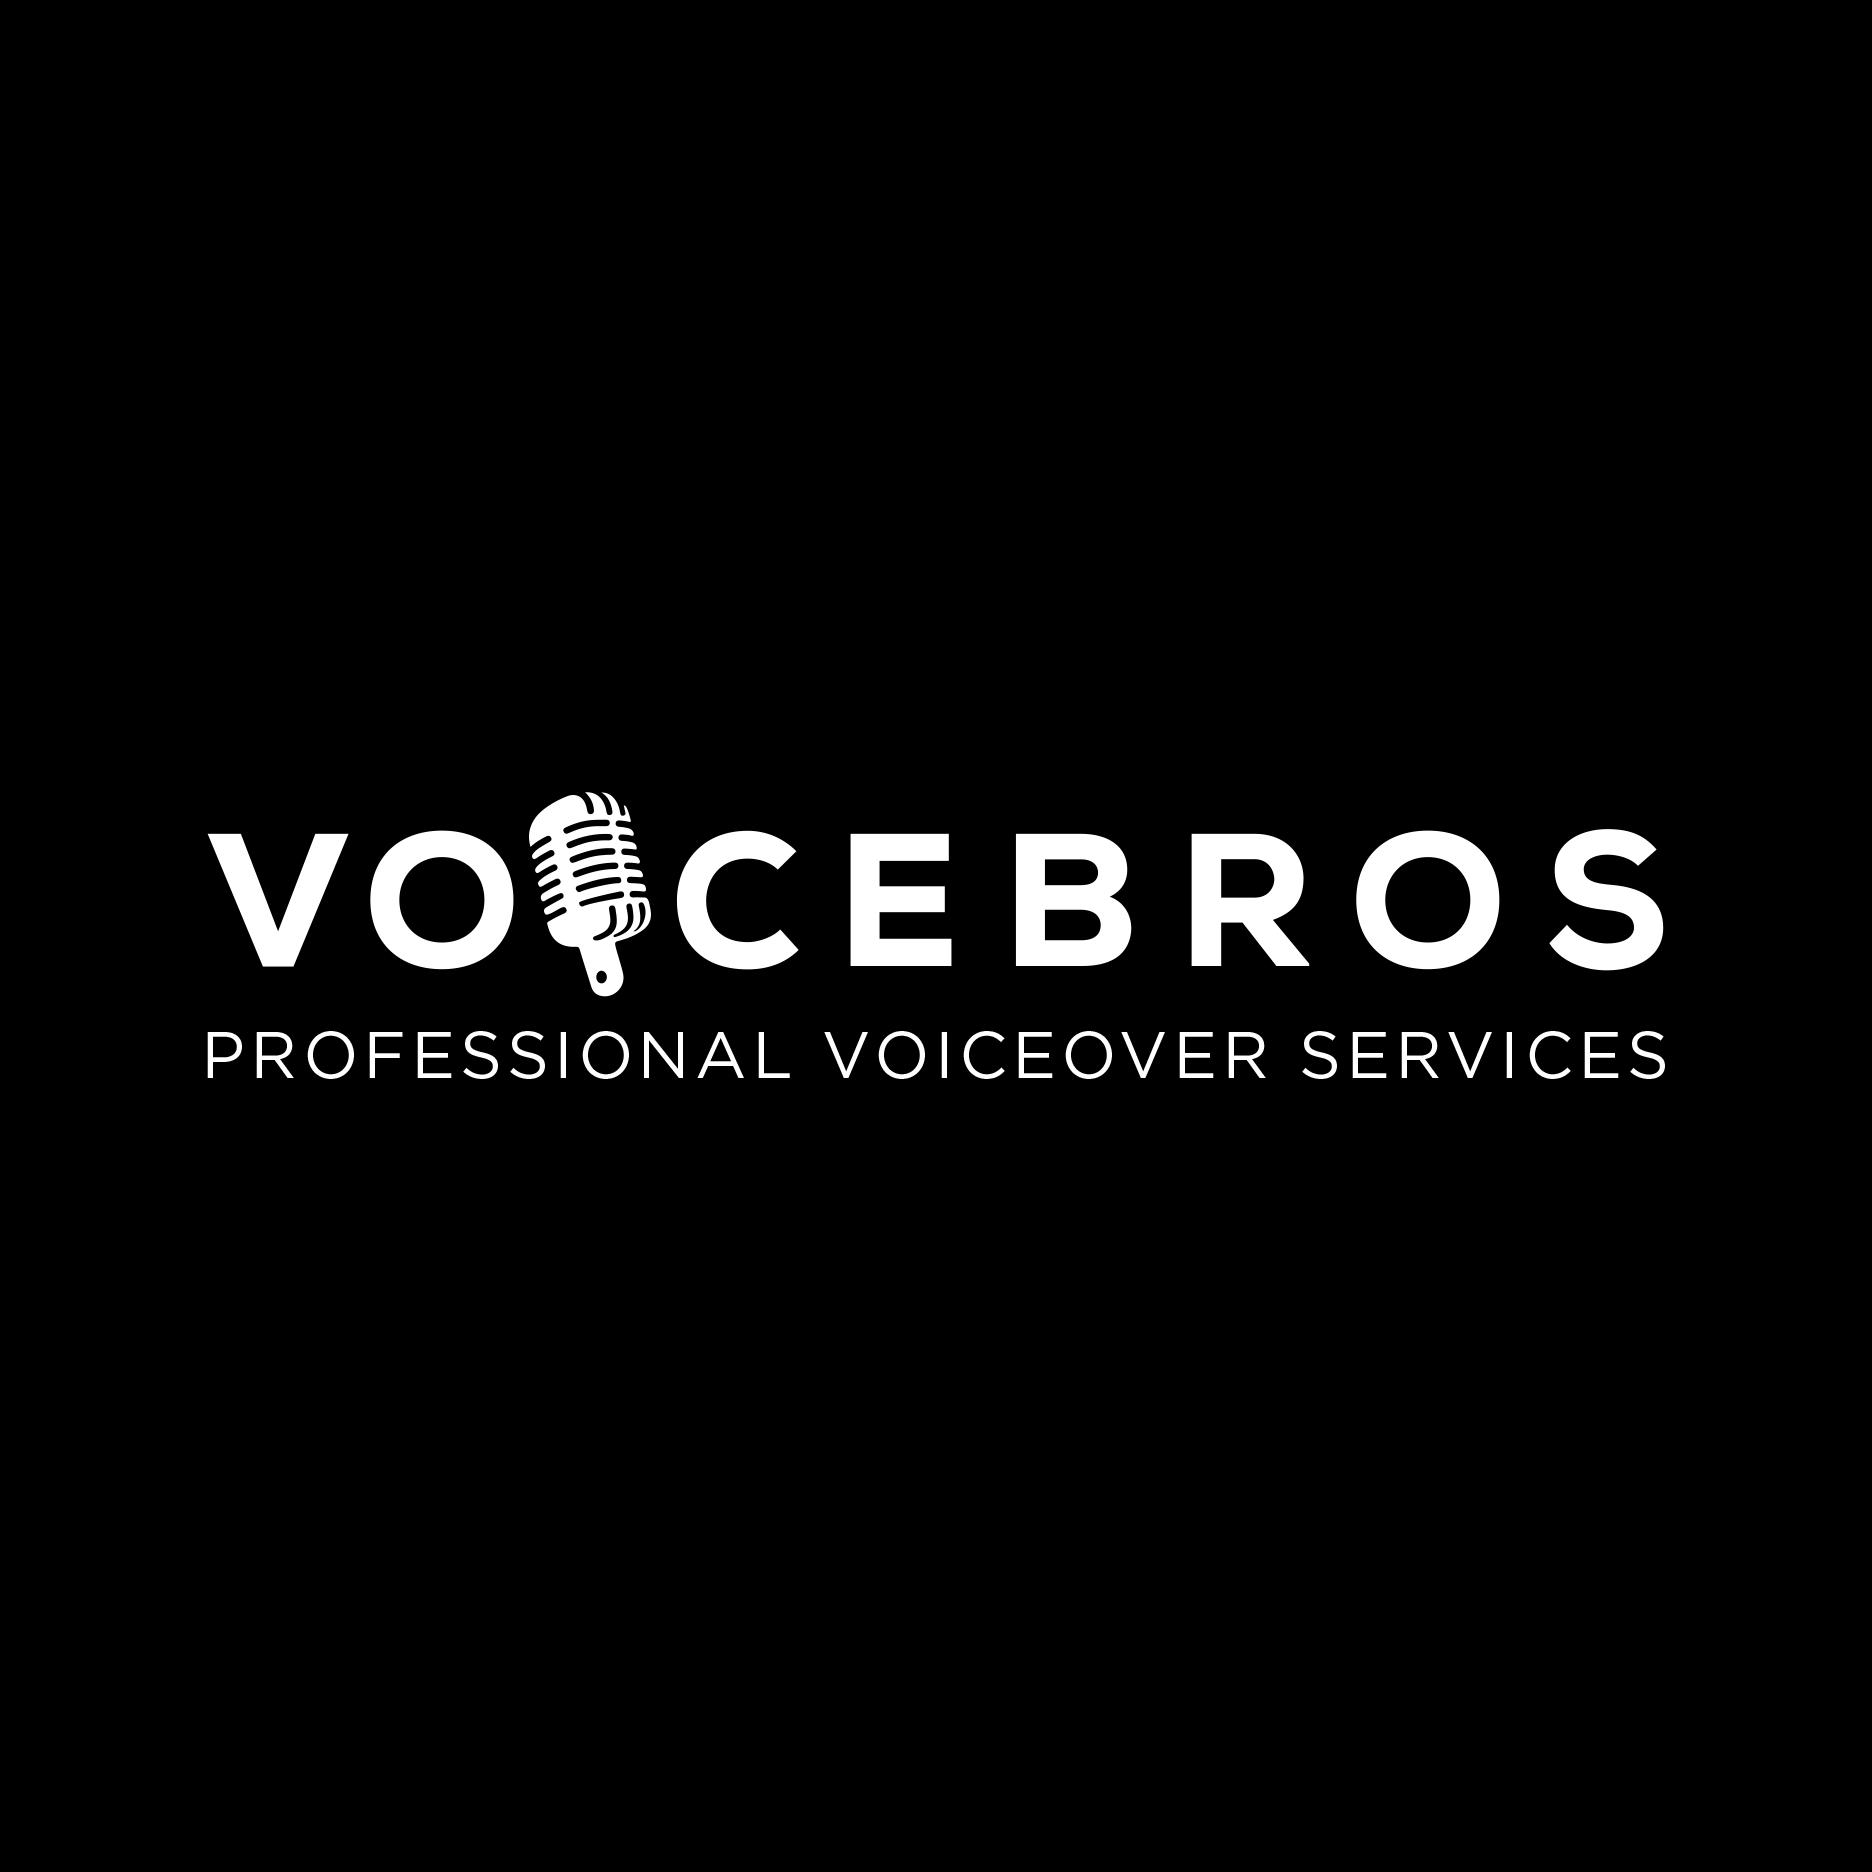 Ivan A. Contreras Jr. is a voice over actor